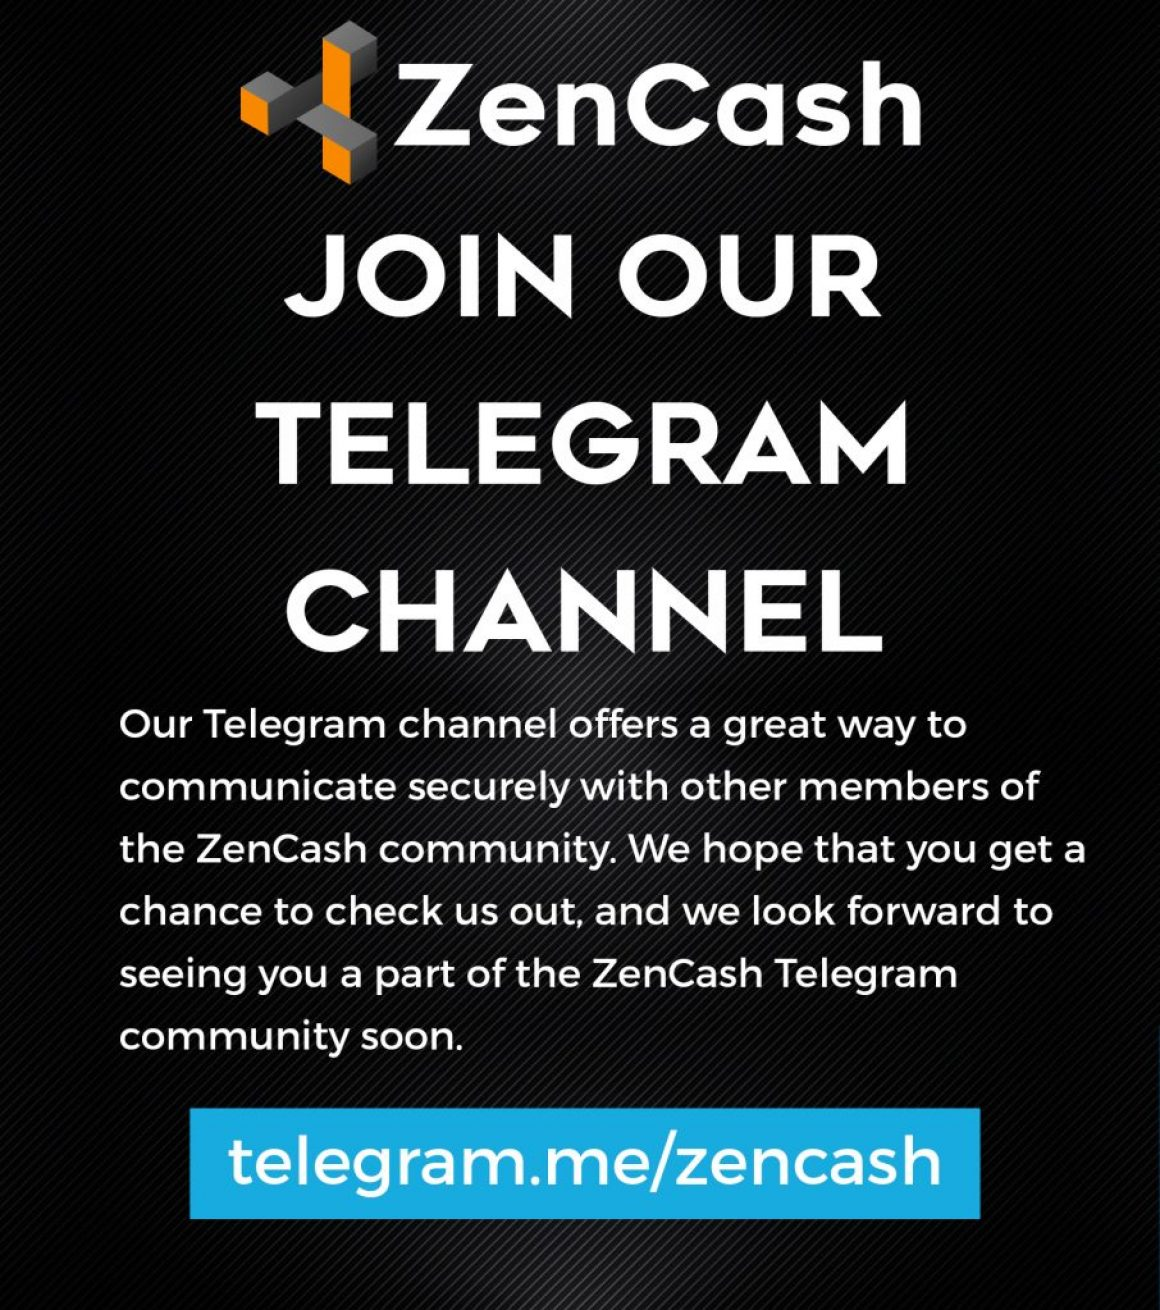 Join the ZenCash Telegram Channel for Secure Talk